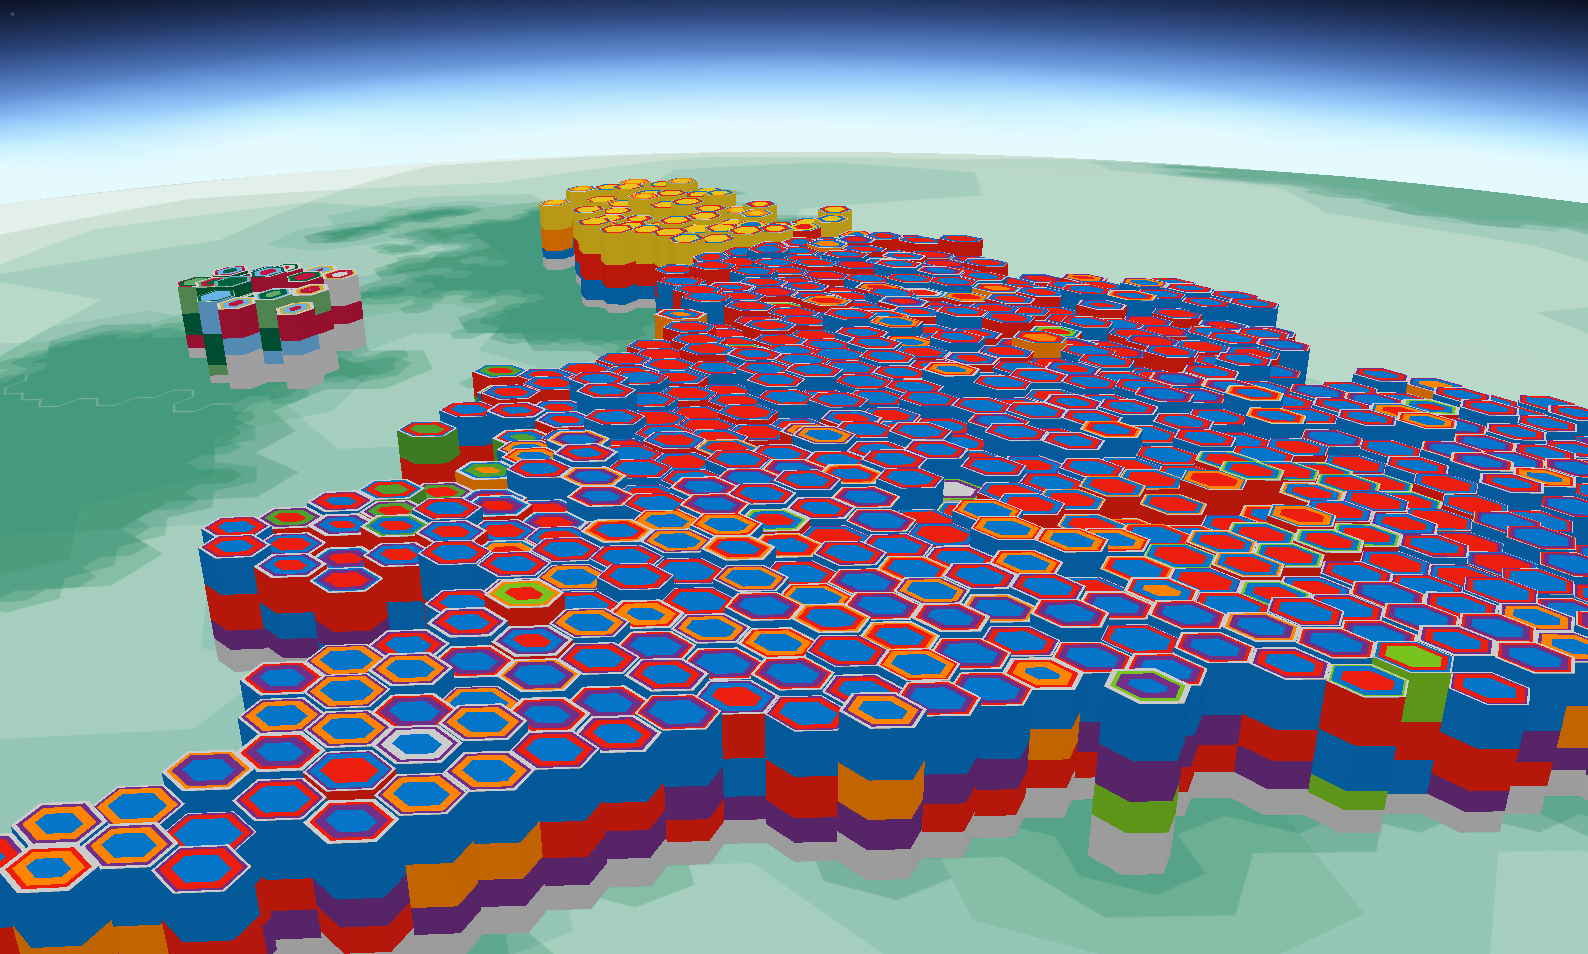 Cartonerd helecxagon mapping my 3d map as a work in progress gumiabroncs Images